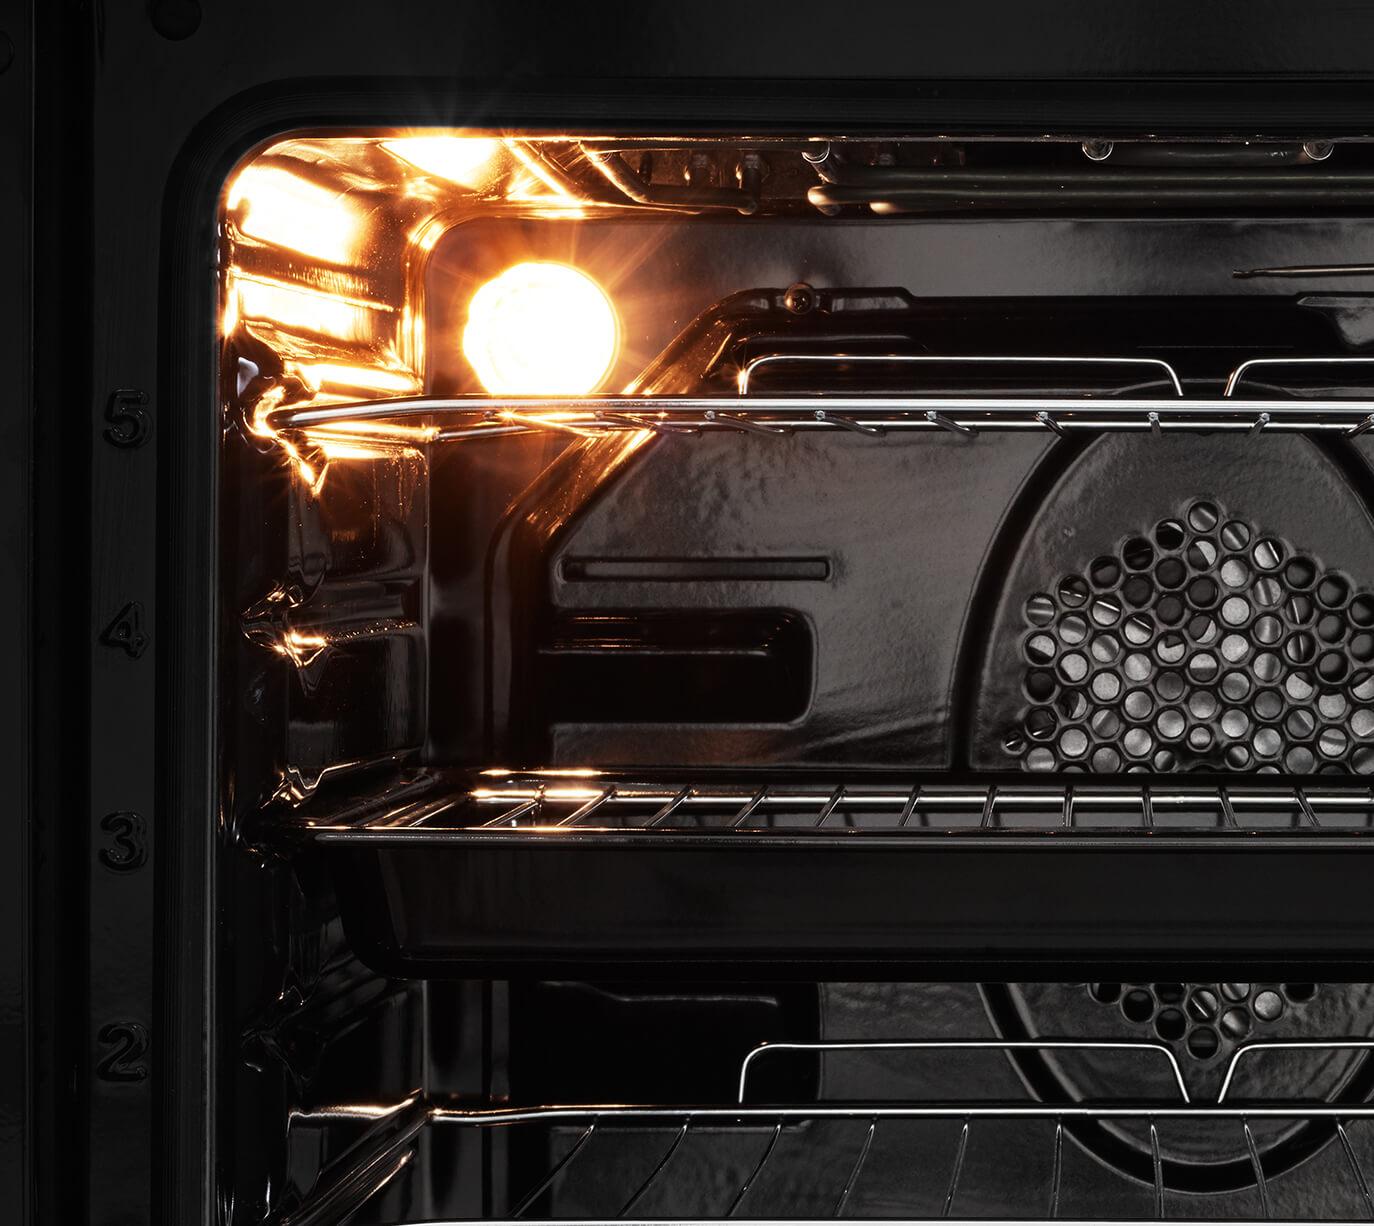 Interior Oven Light